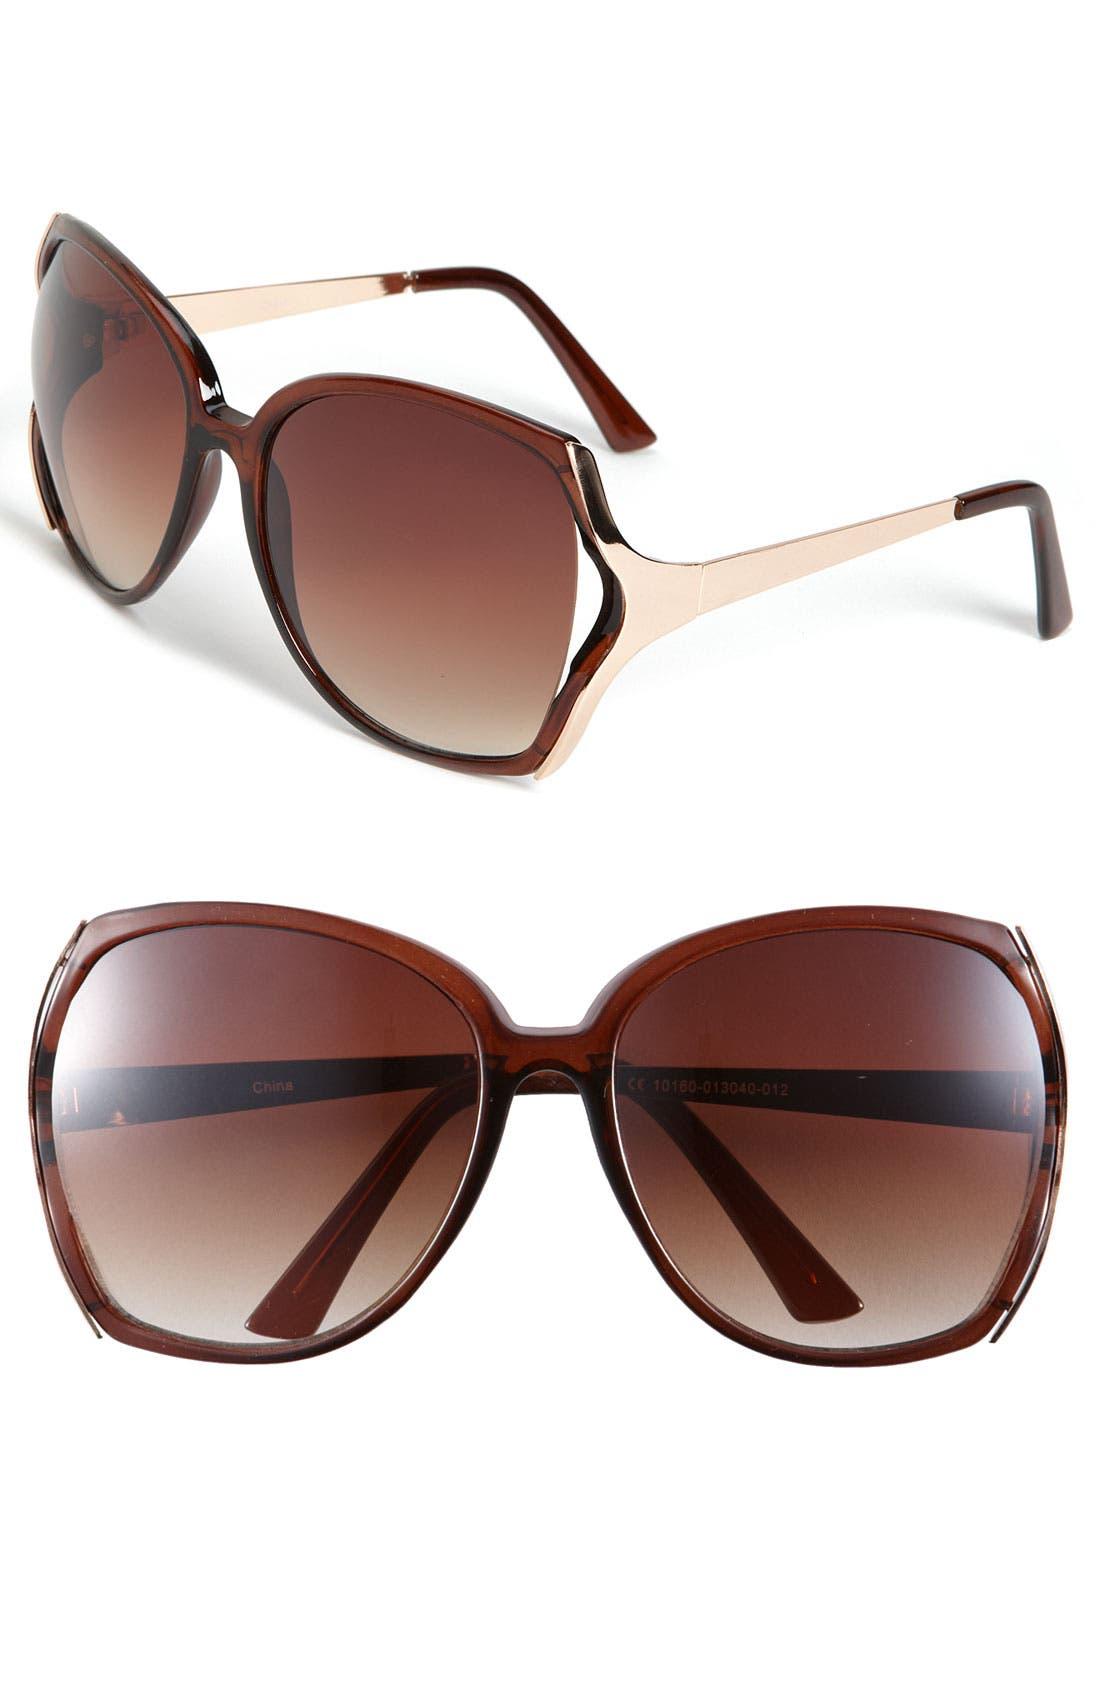 Main Image - Icon Eyewear 'Paris' Sunglasses (2 for $20)